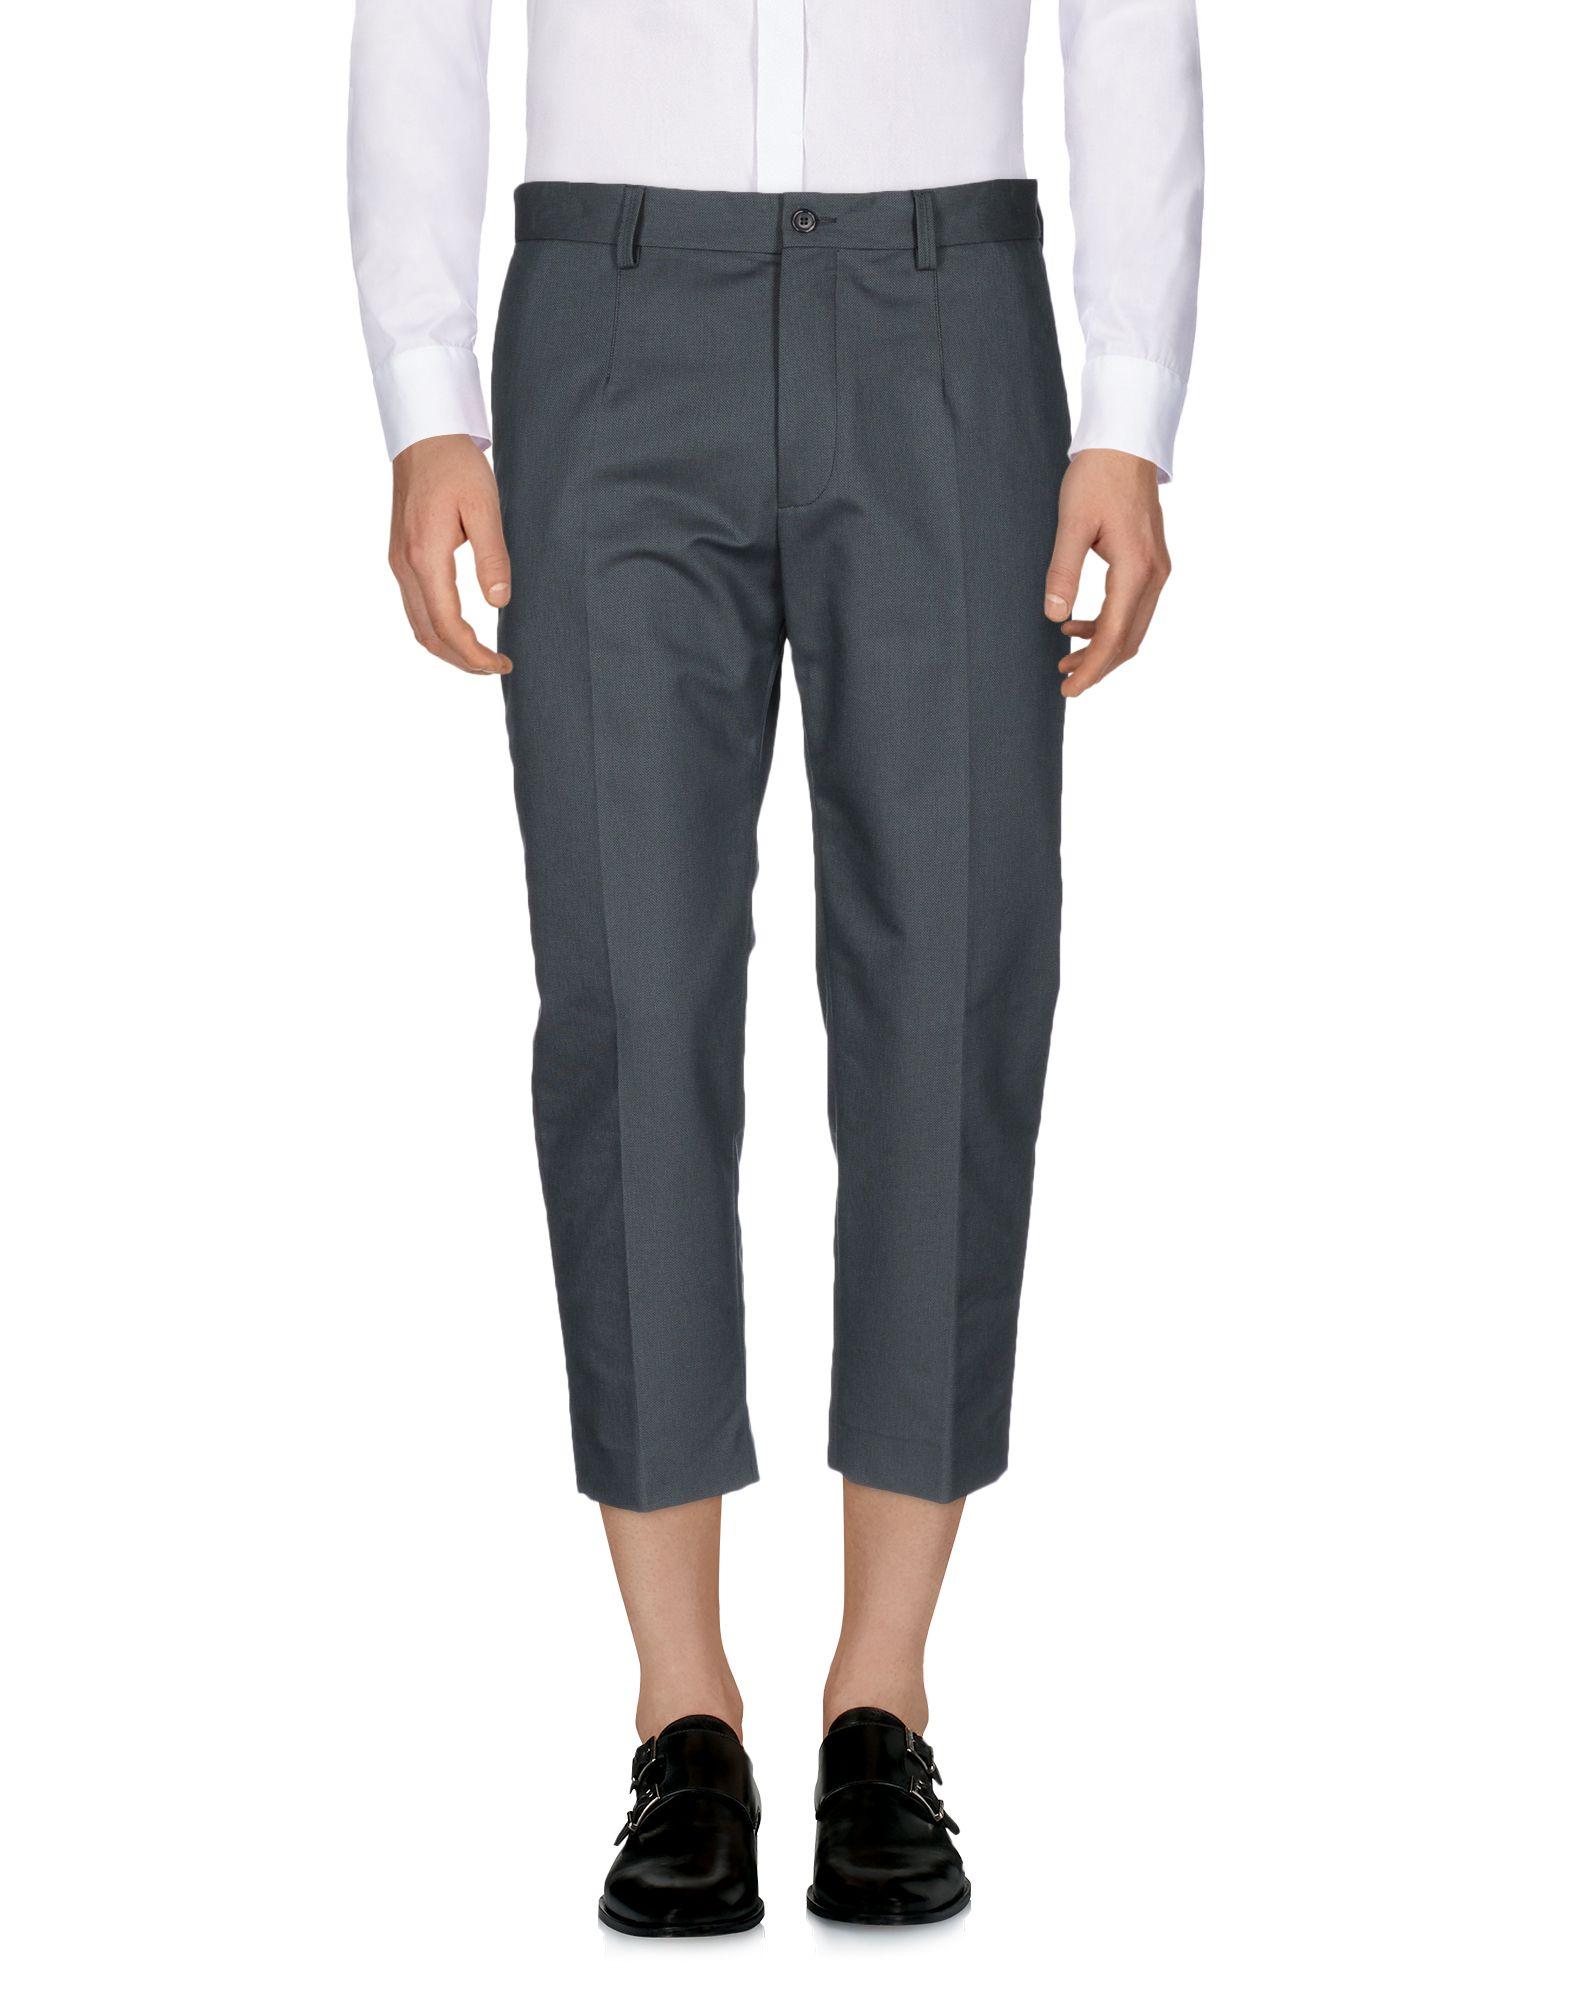 Pantalone Classico Dolce & Gabbana Uomo 13010507NB - 13010507NB Uomo 18ec95